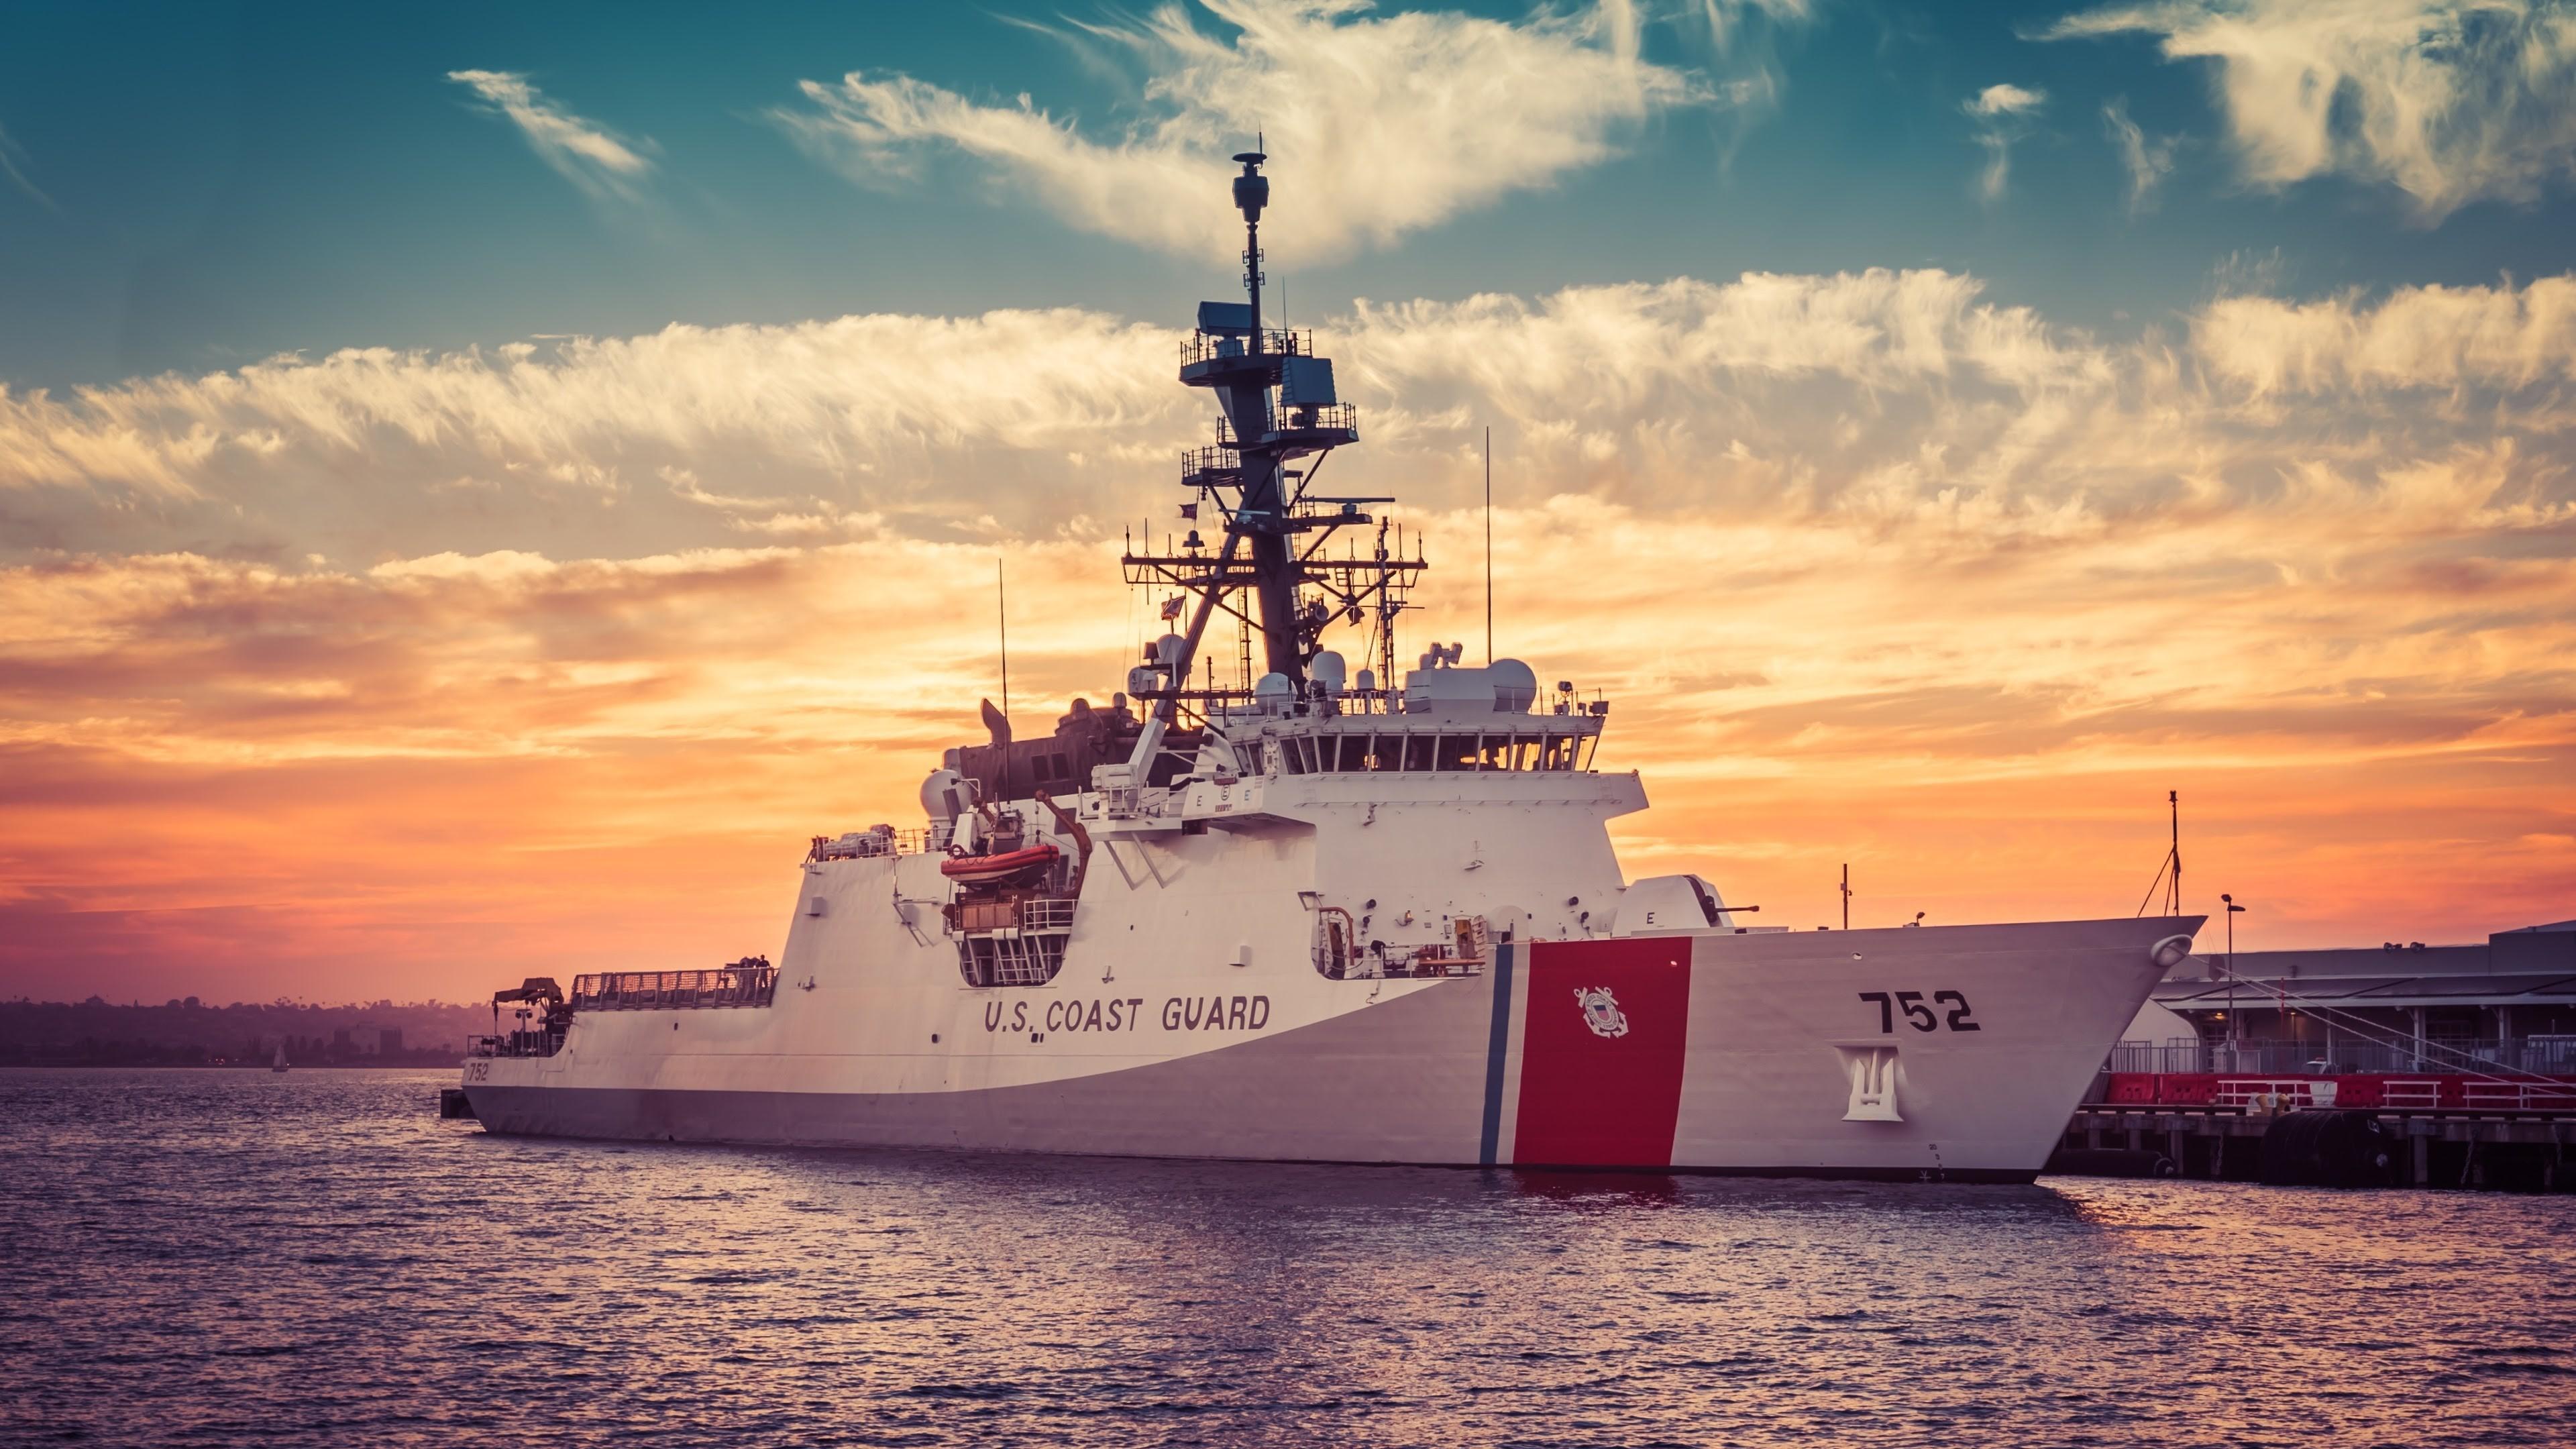 Us navy ships wallpaper 58 images - Coast guard wallpaper ...